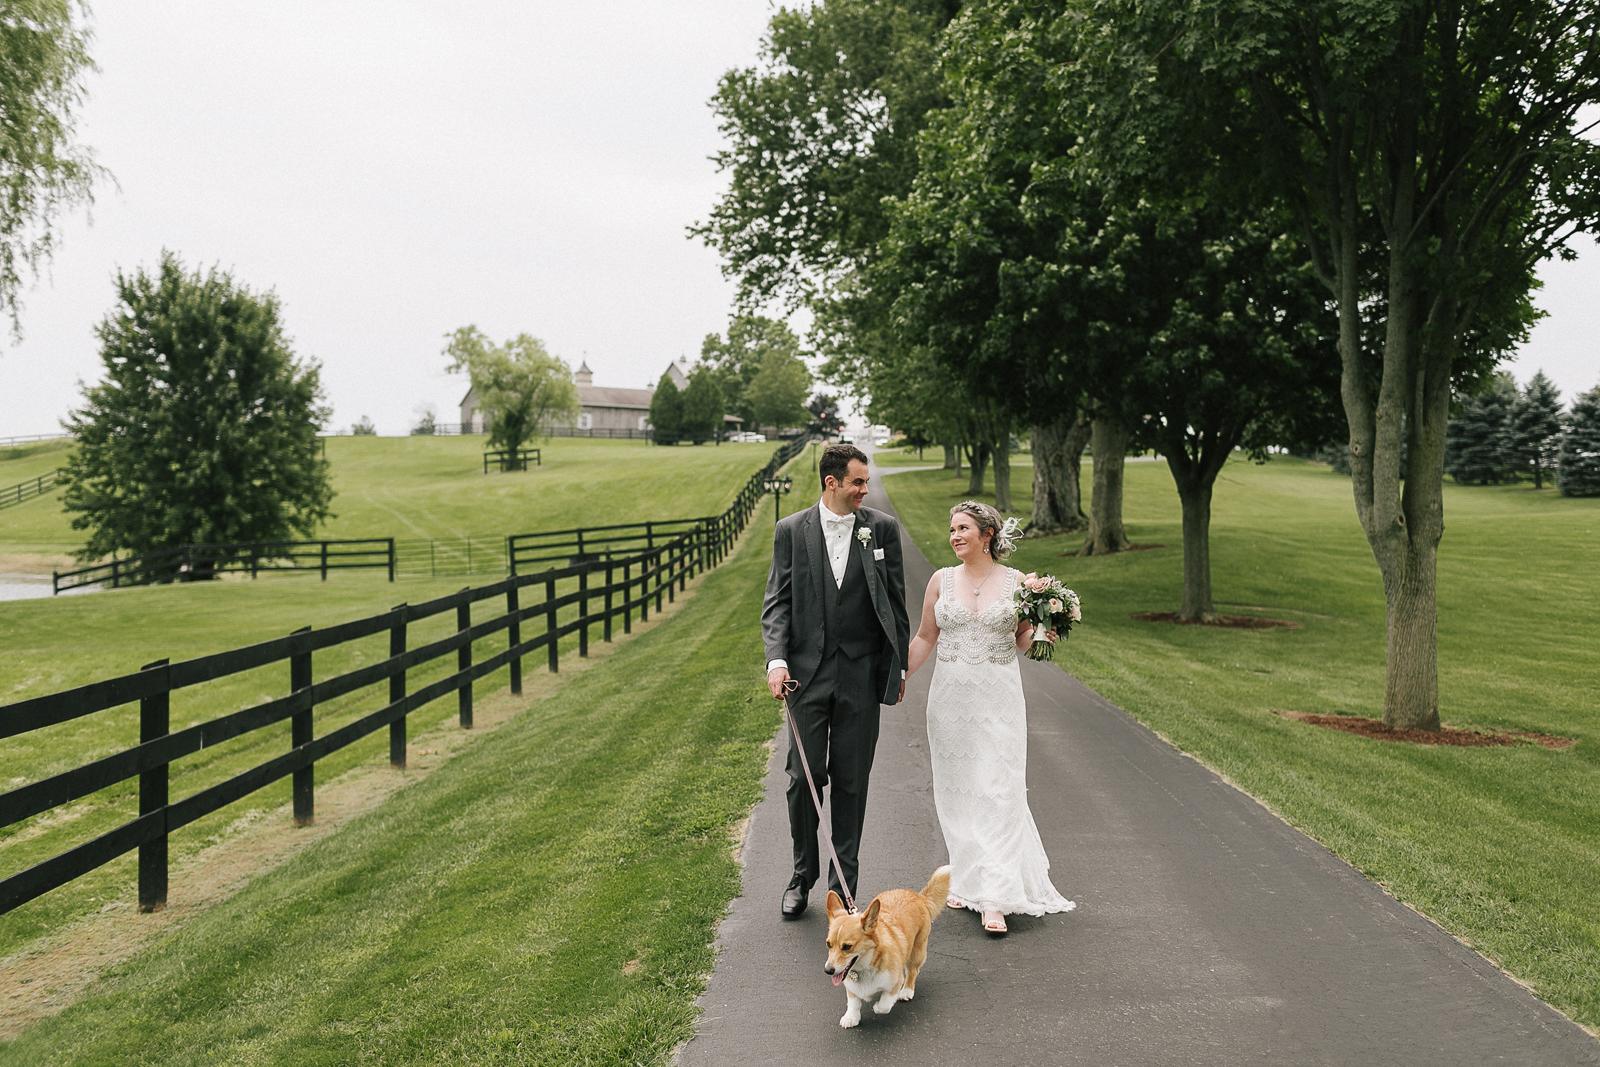 mike-and-jenni-wedding-070.jpg